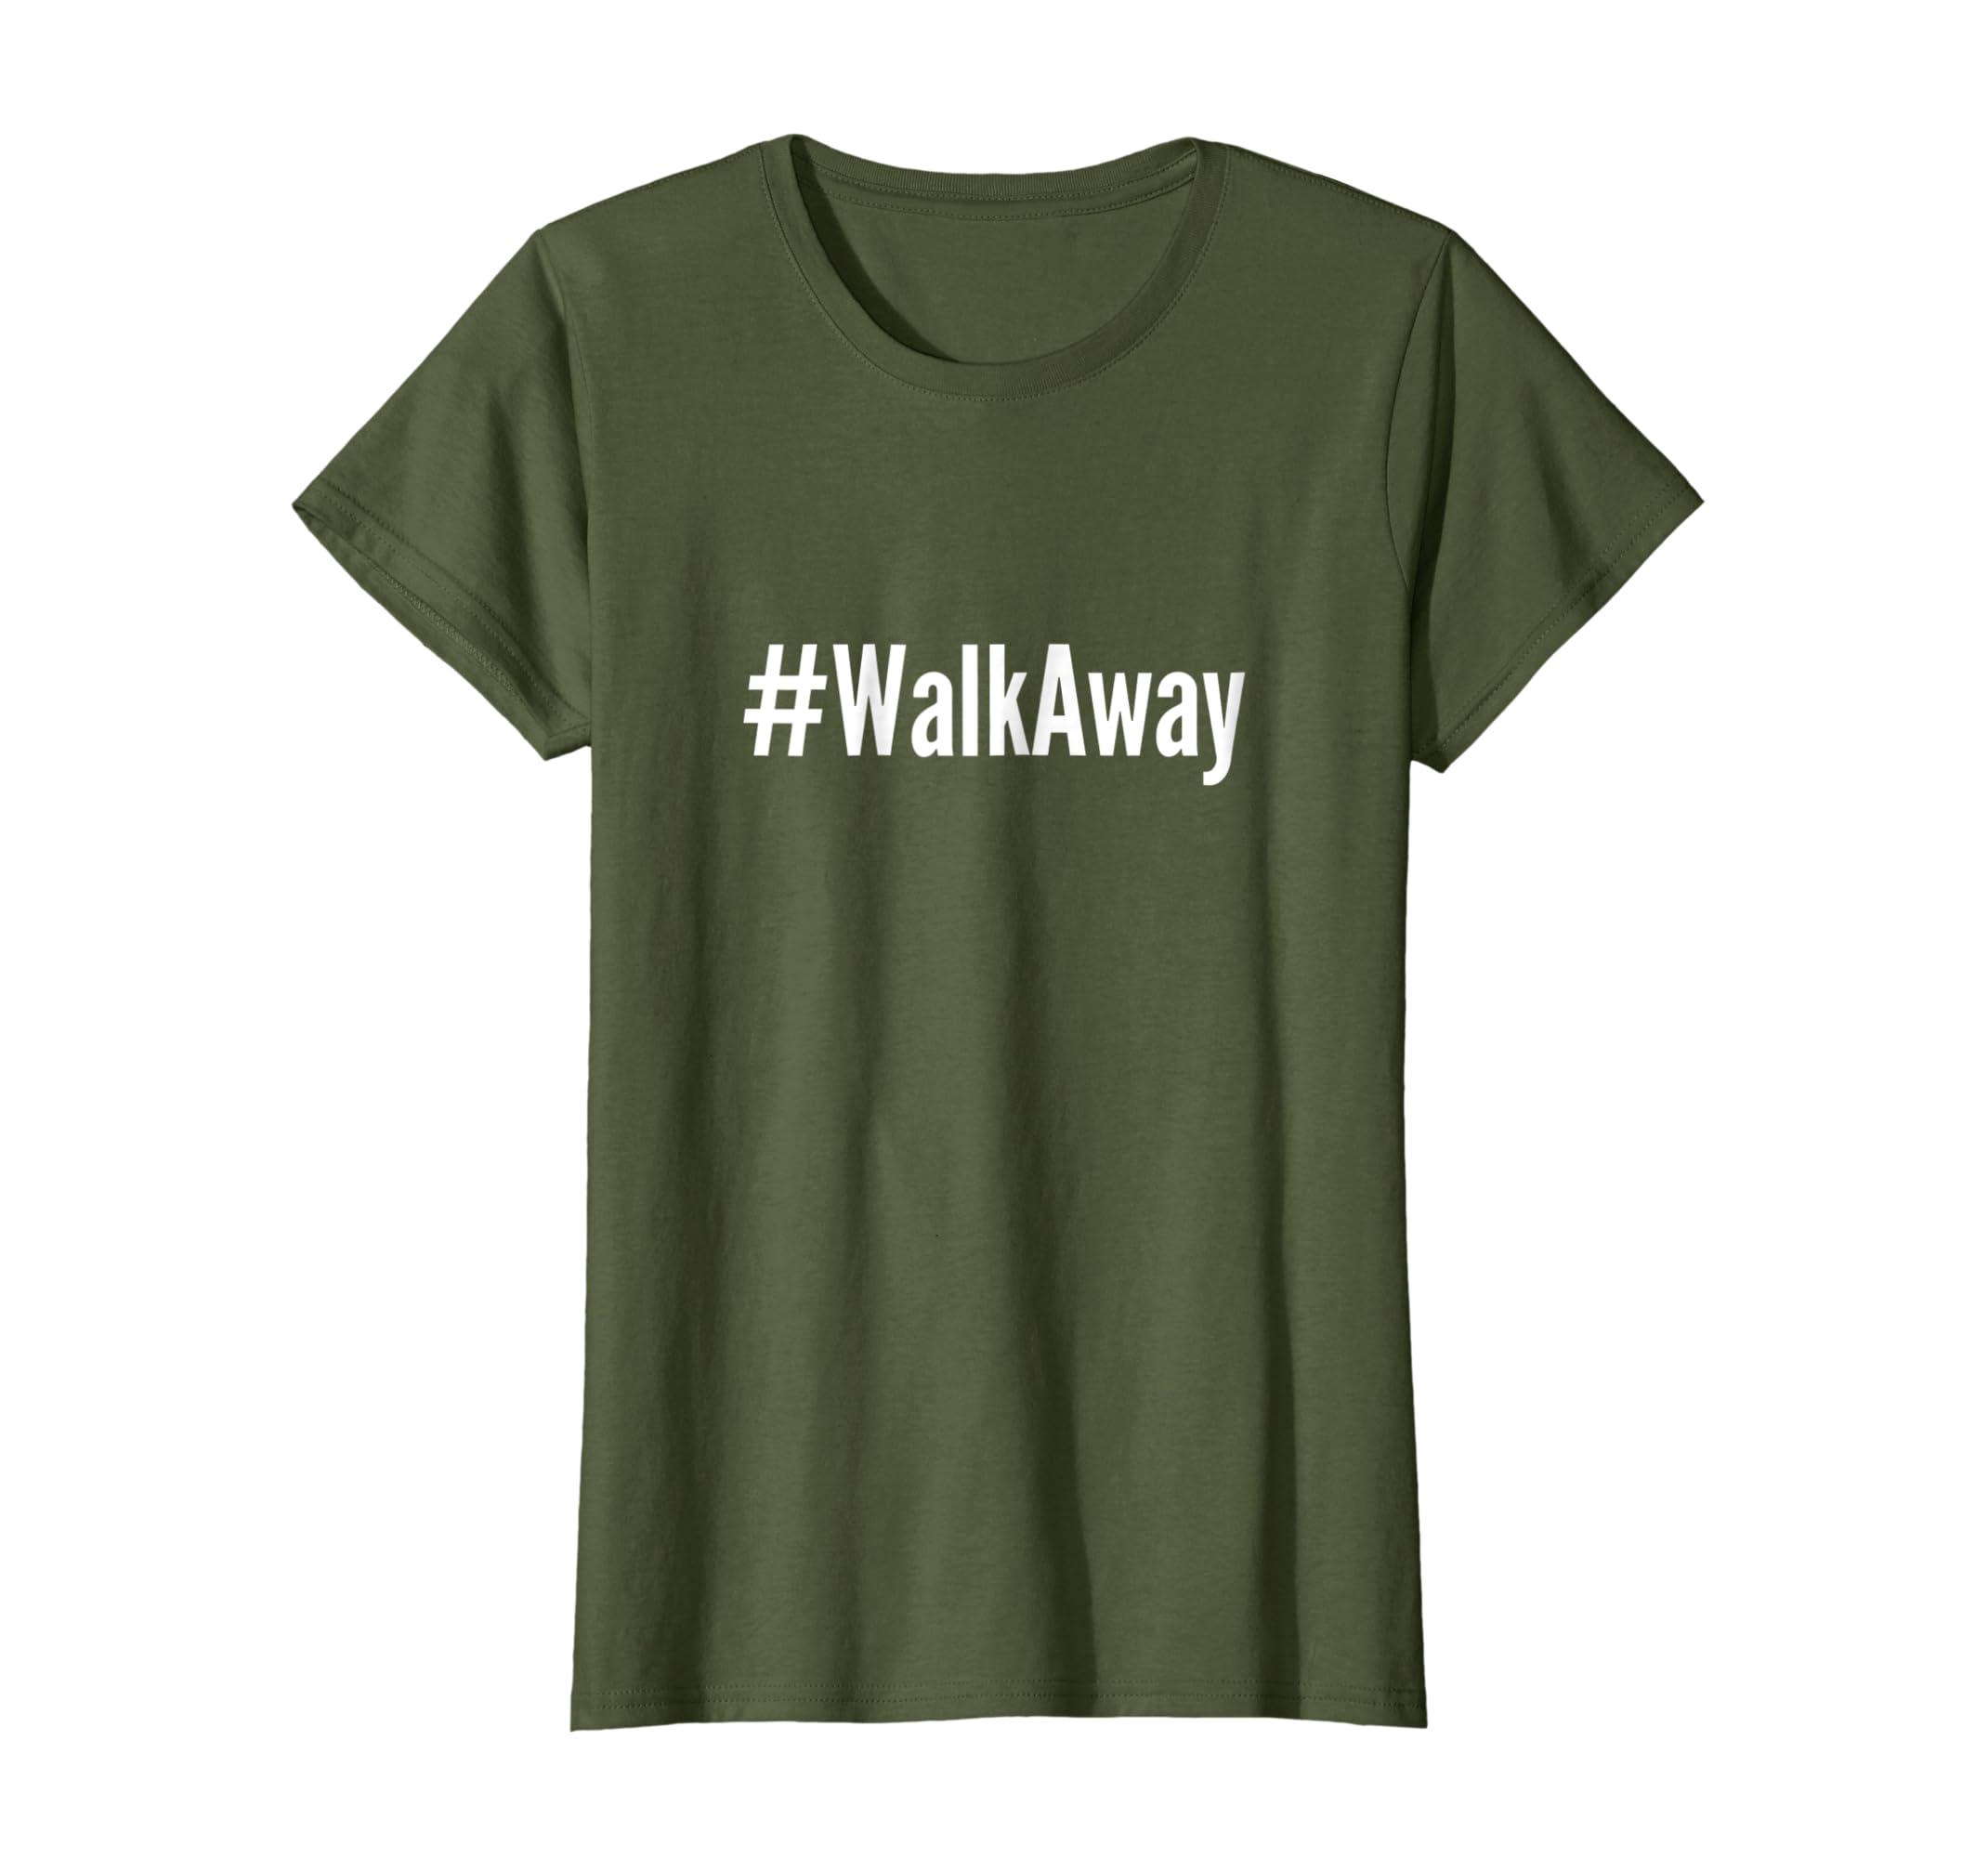 #WalkAway Movement Fan T shirt Tee Top for Men Women Kids